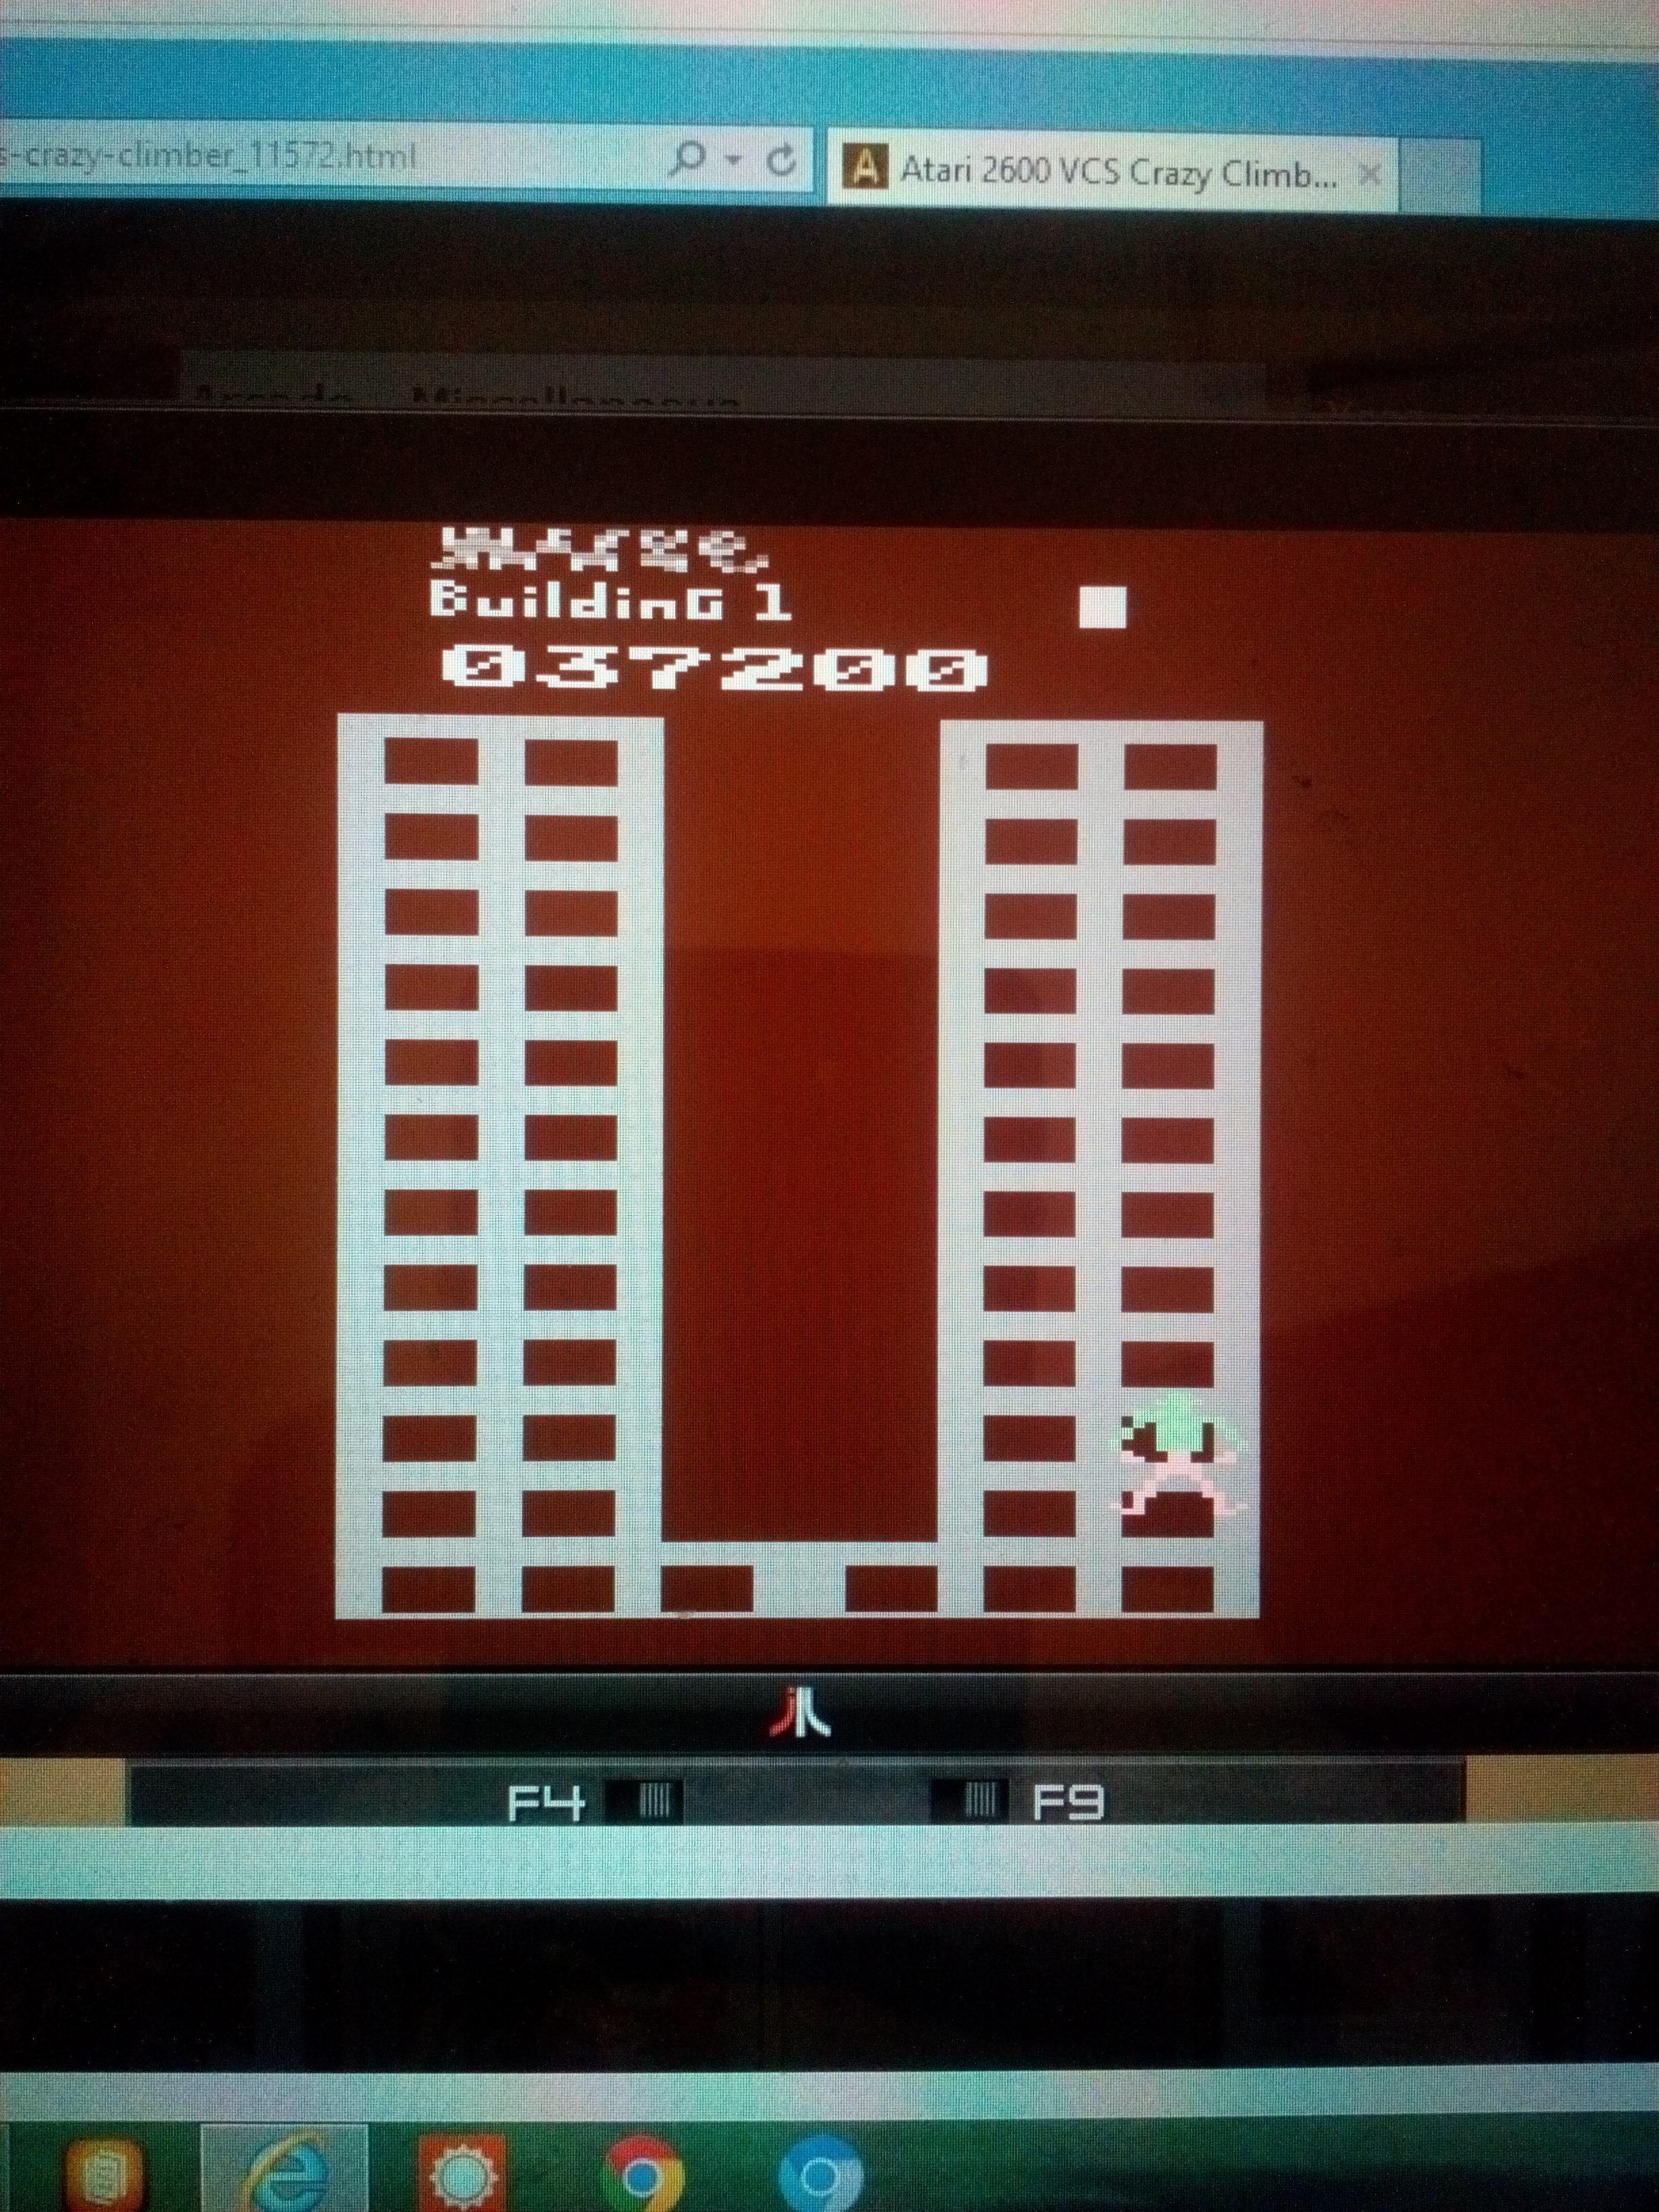 MisterVCS: Crazy Climber (Atari 2600 Emulated Novice/B Mode) 37,200 points on 2017-07-09 03:40:19